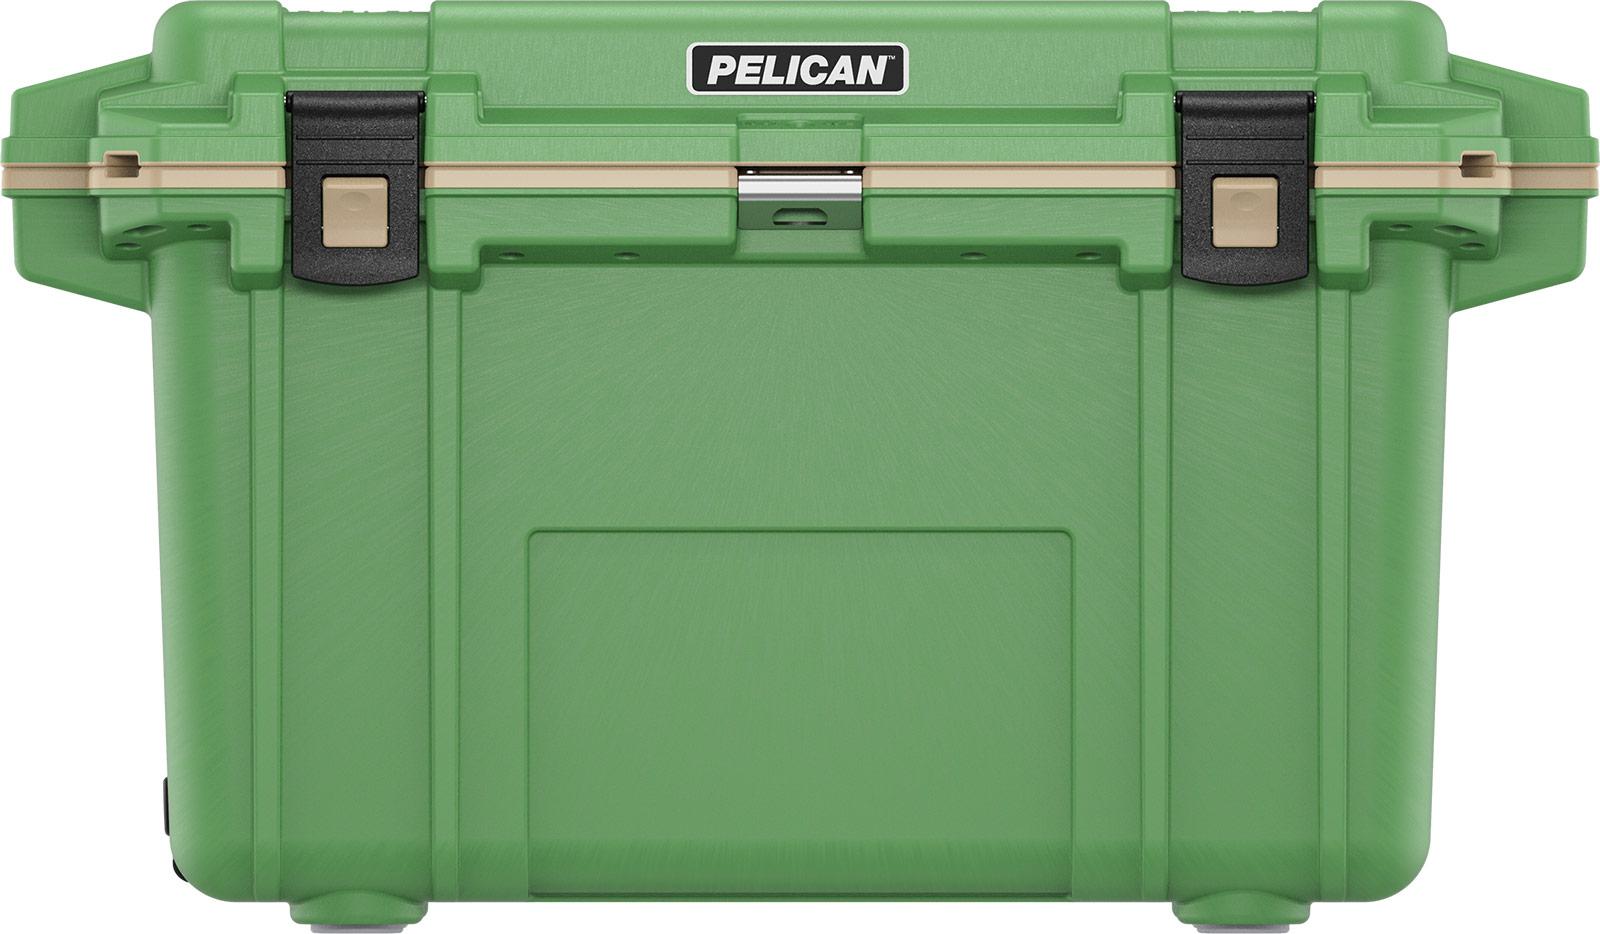 pelican overland coolers 70qt green cooler